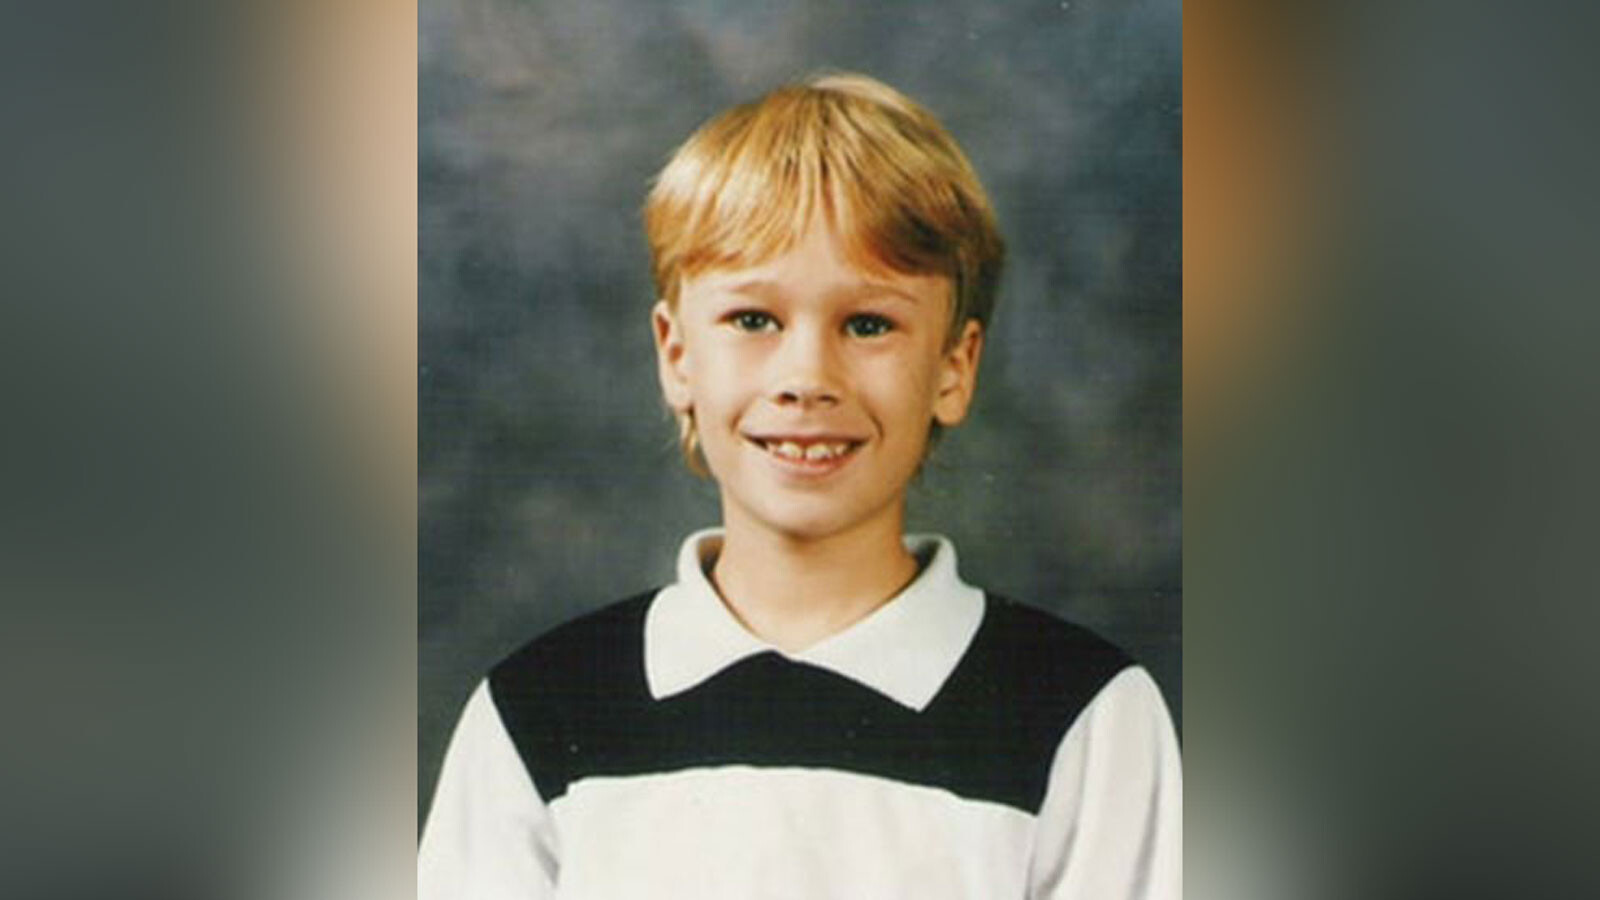 Georgia police make arrest in 1988 murder of 8-year-old Joshua Harmon